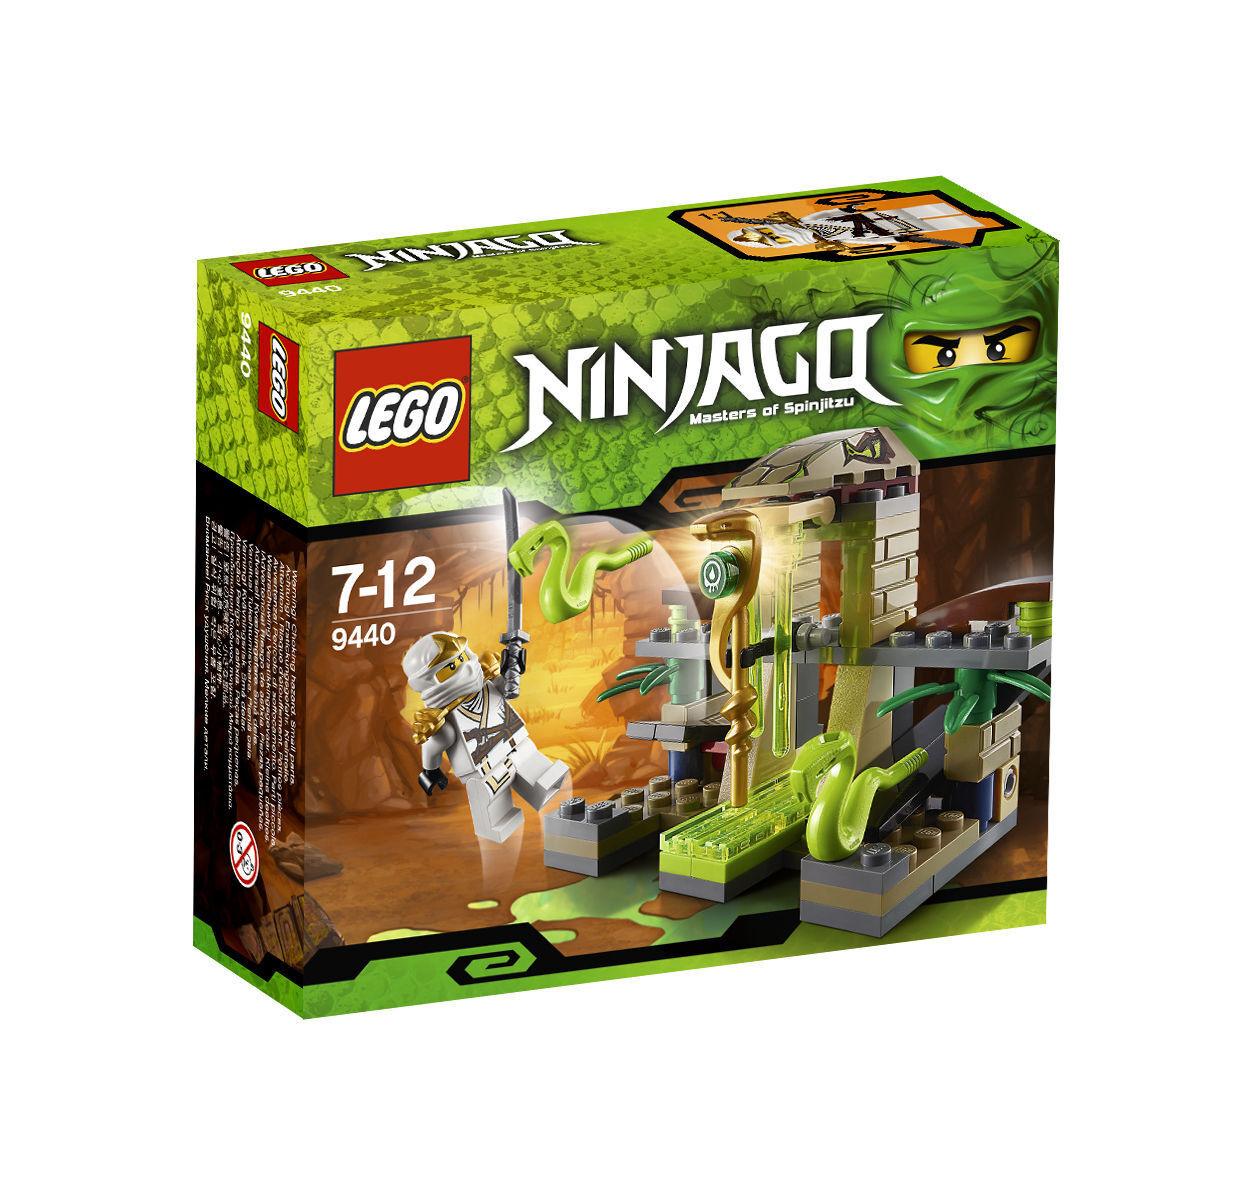 Lego Ninjago sanctuaire des giftnattern (9440)